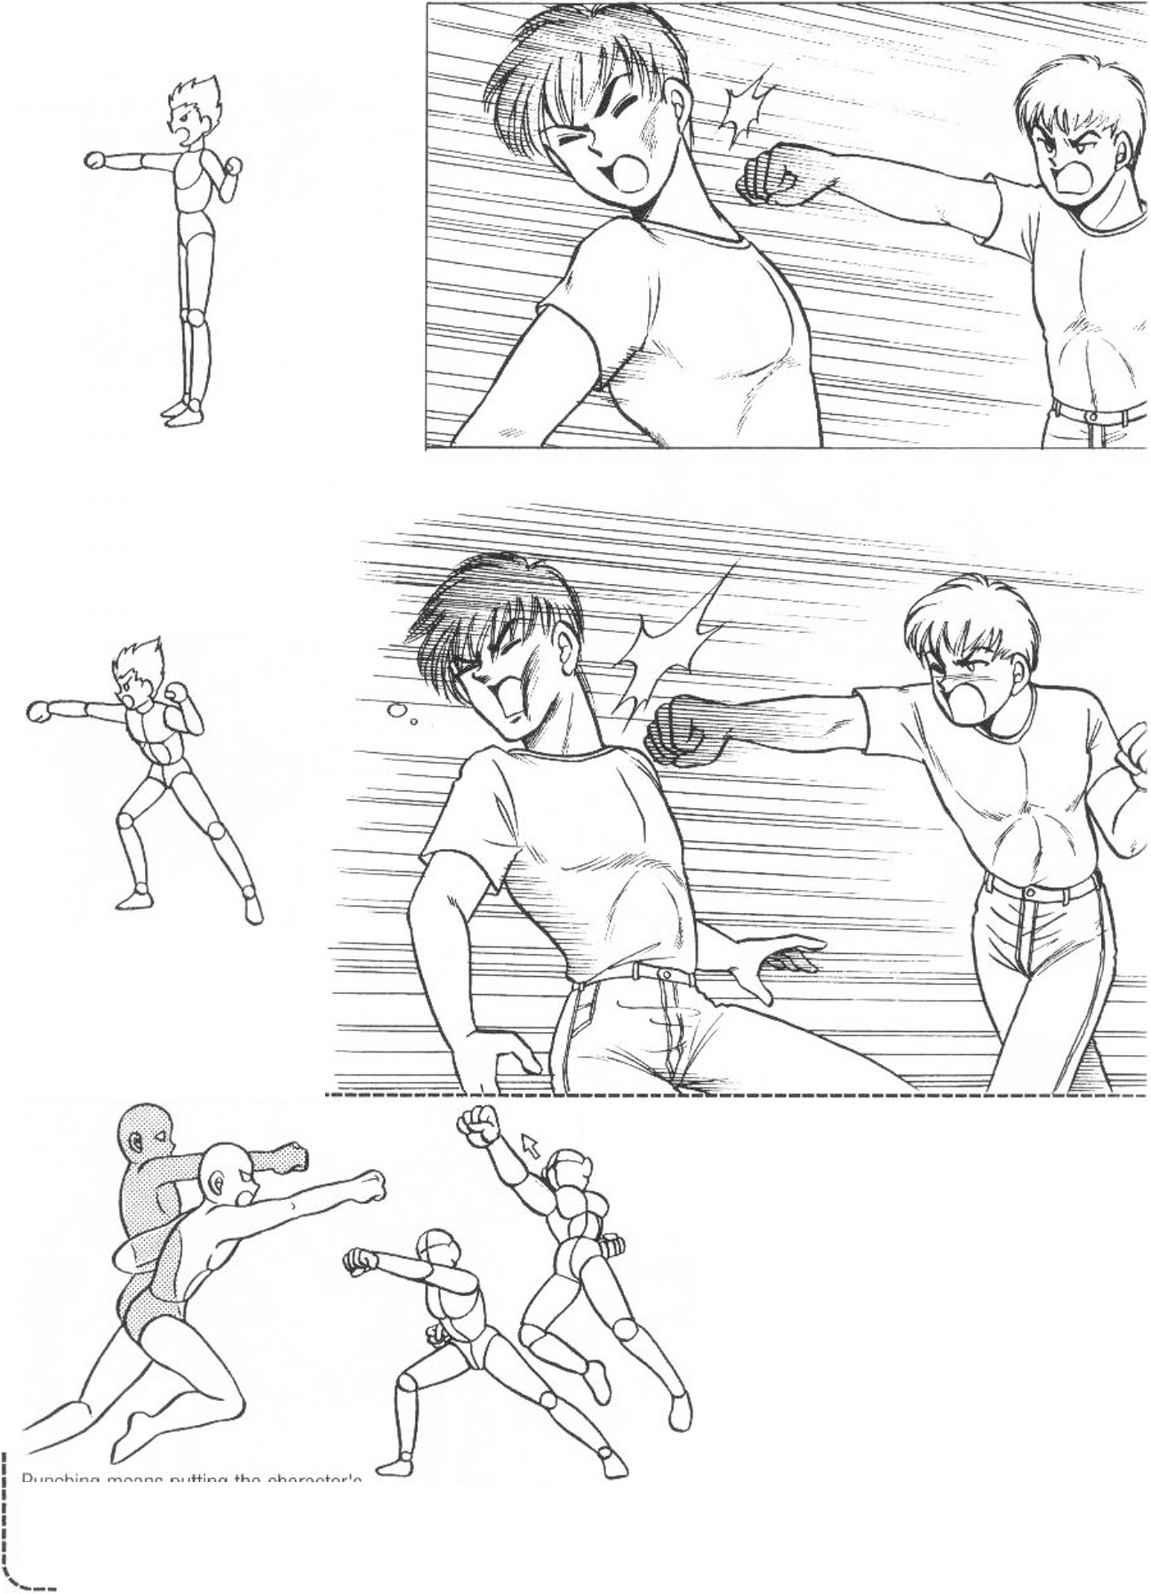 Bodie manga how draw the human body